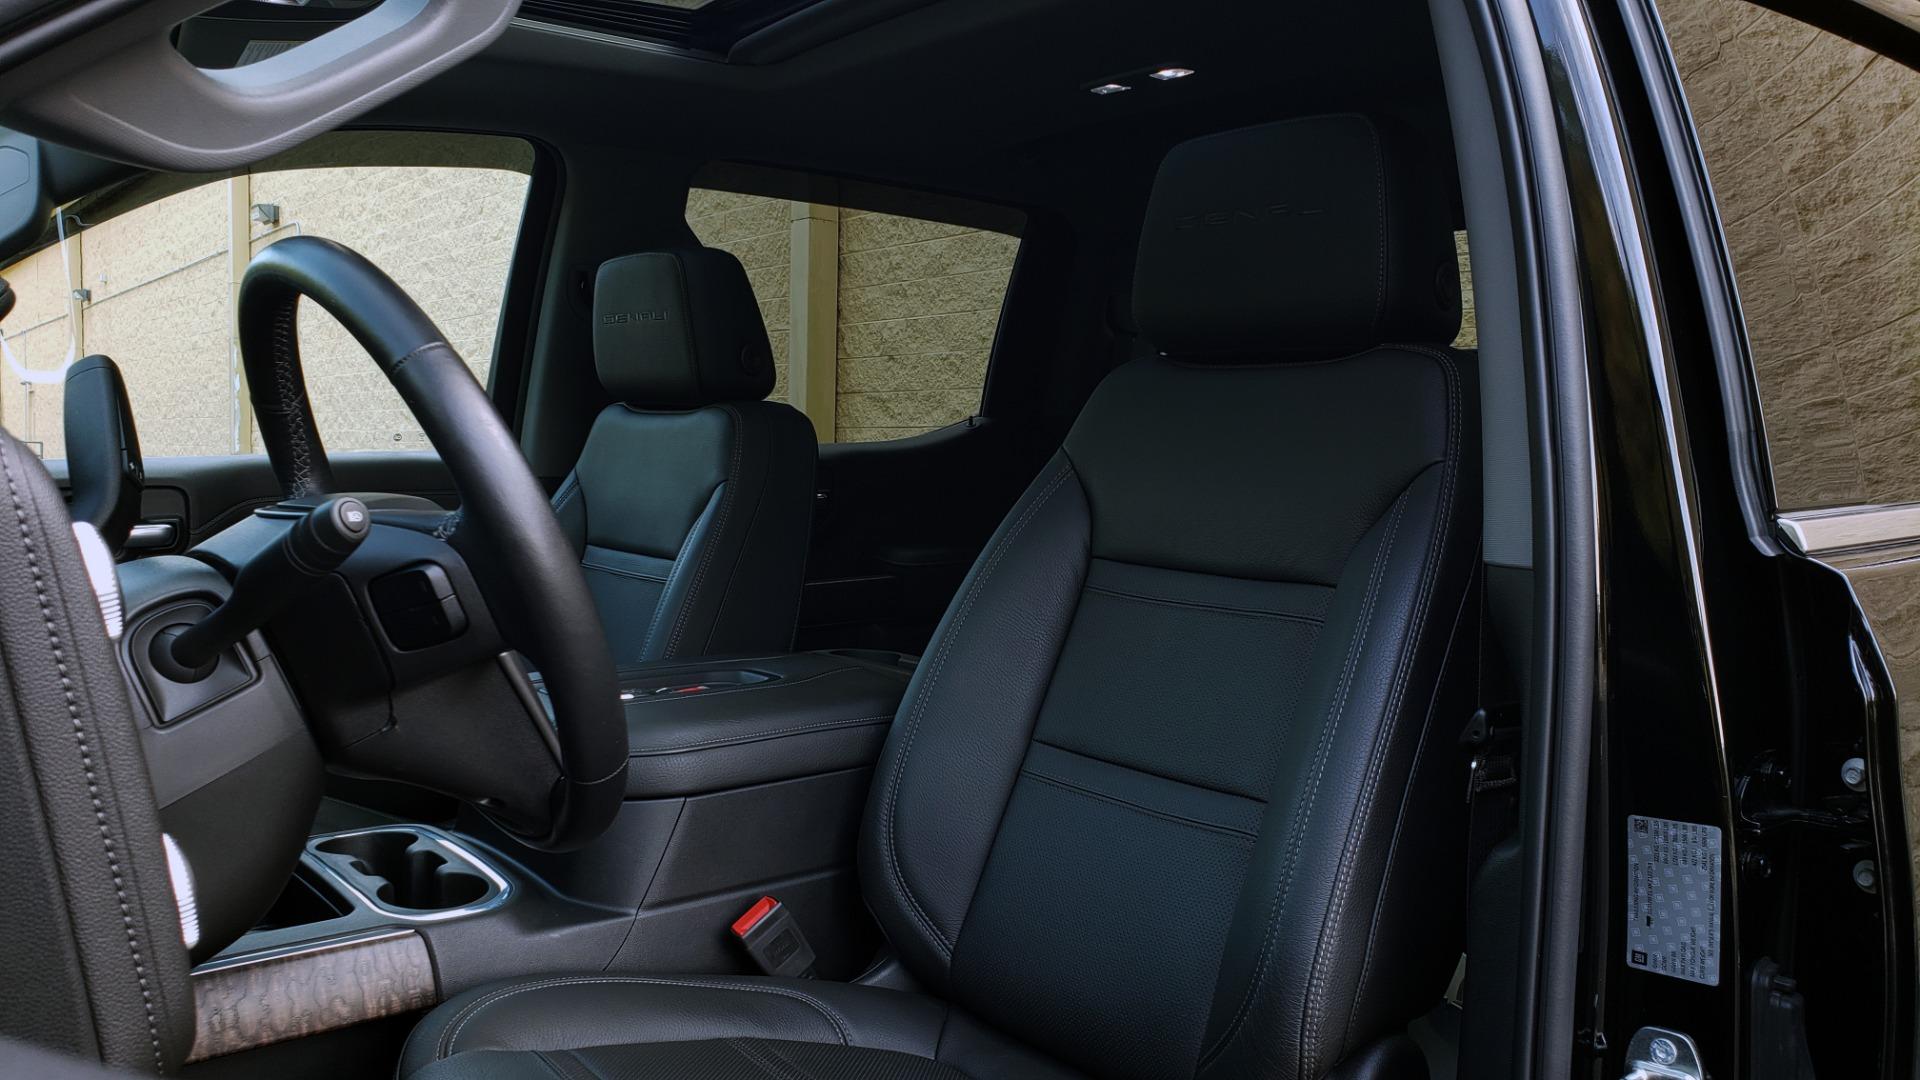 Used 2019 GMC SIERRA 1500 DENALI ULTIMATE 4WD / NAV / TECH PKG / DRVR ALRT for sale Sold at Formula Imports in Charlotte NC 28227 44